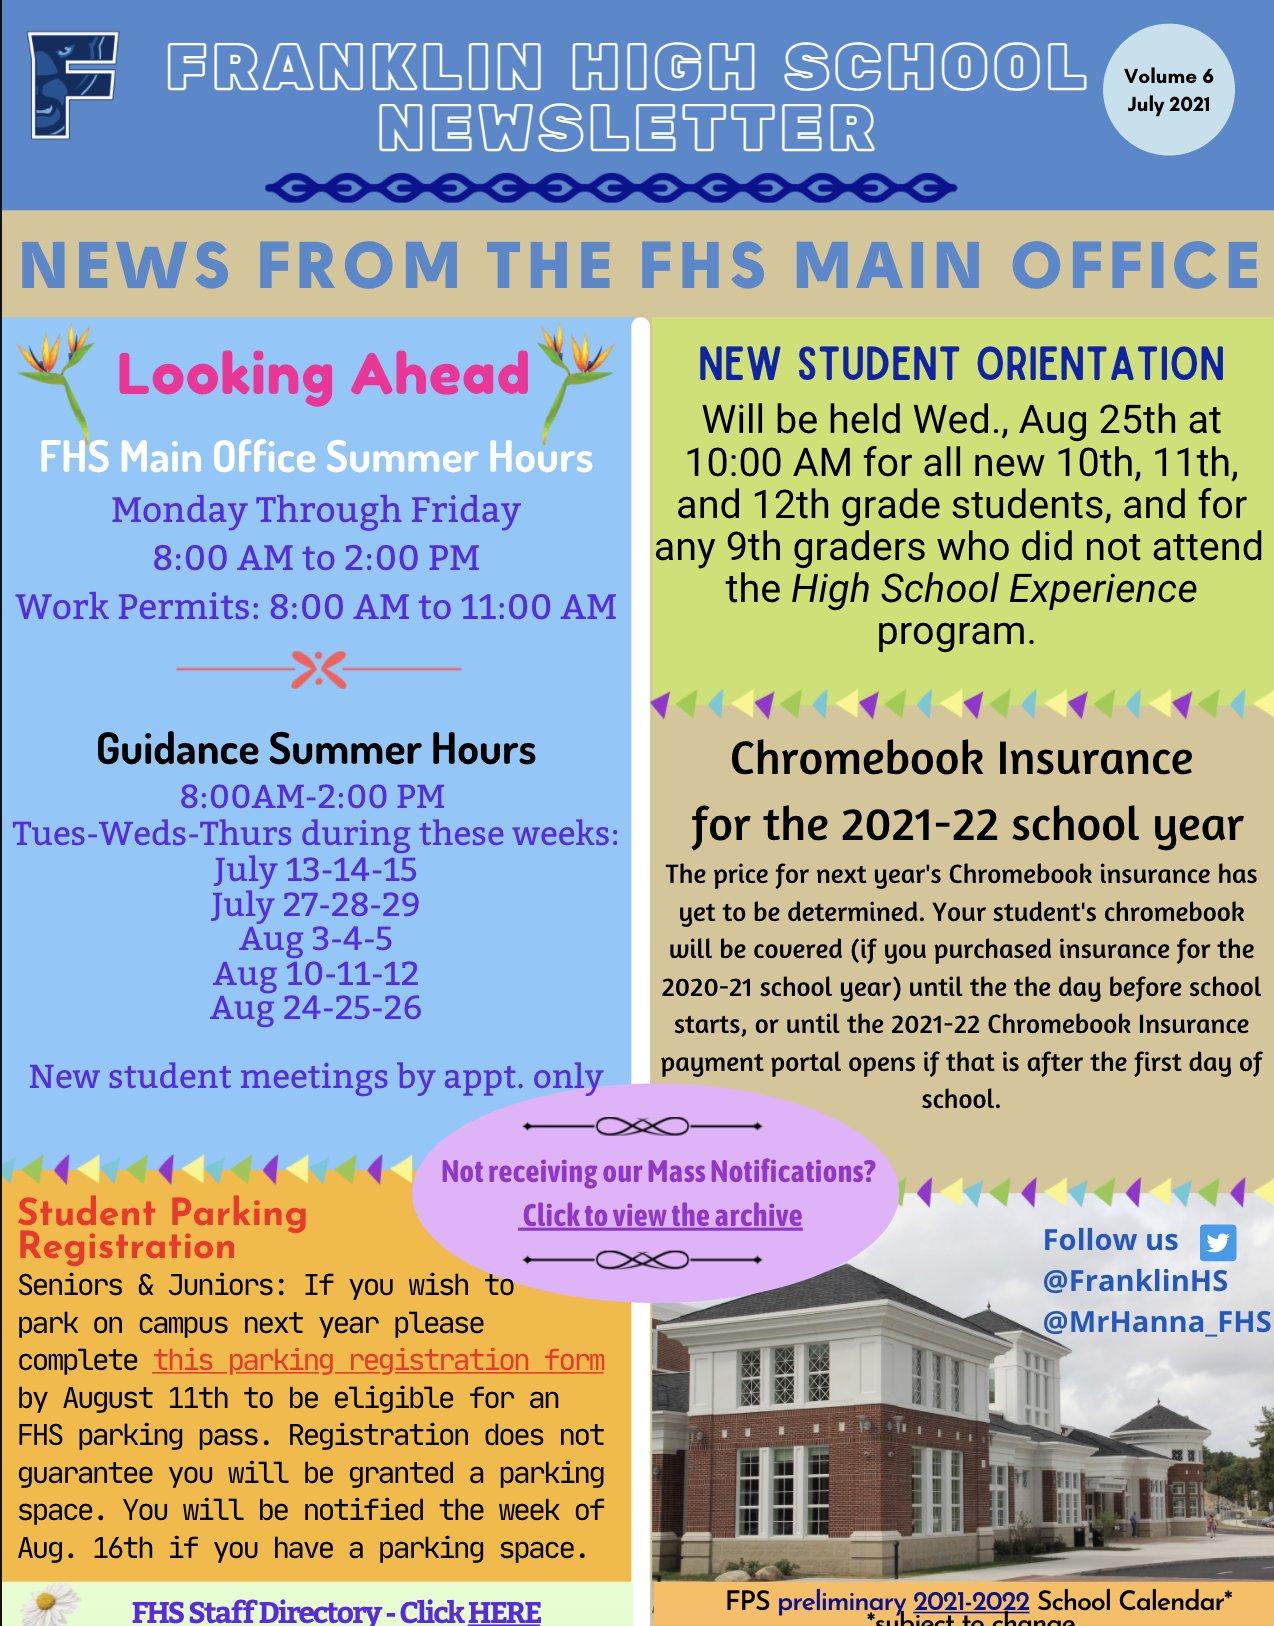 Franklin High School - Mid-Summer Newsletter